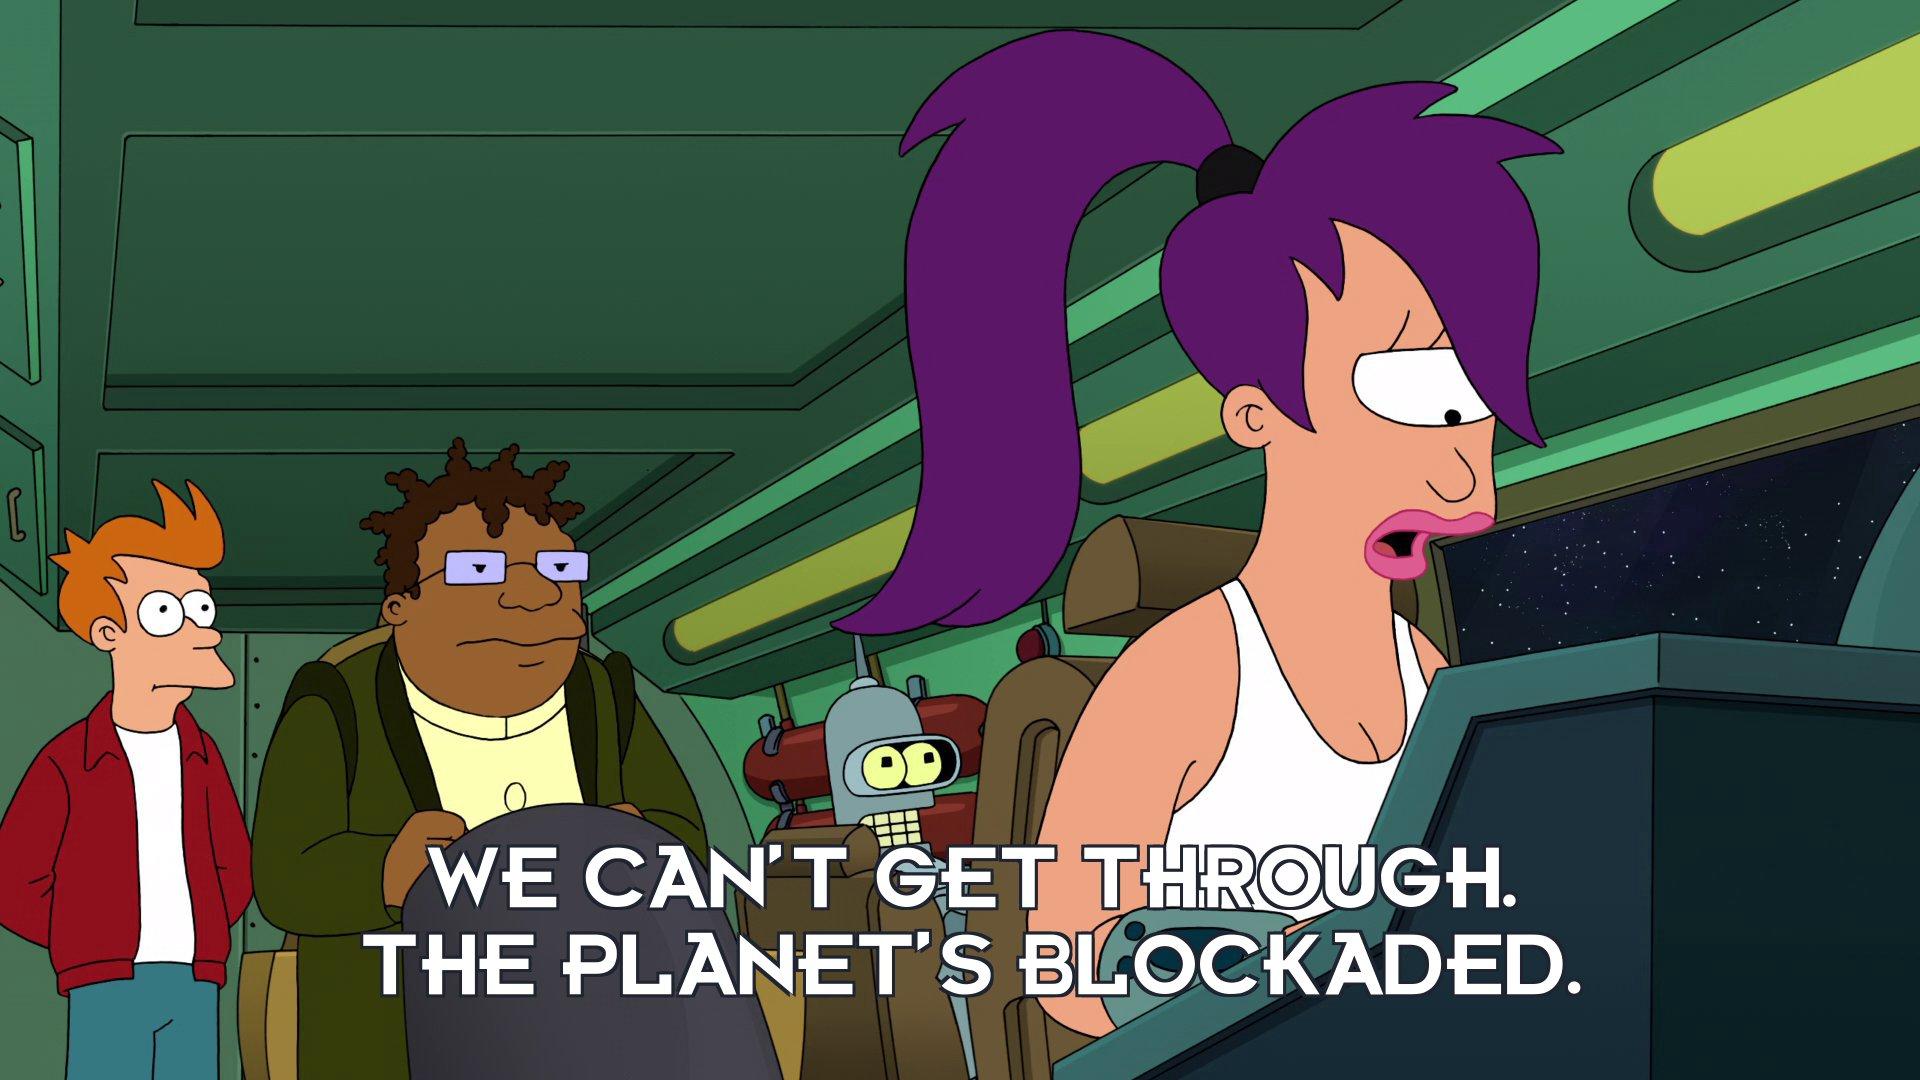 Turanga Leela: We can't get through. The planet's blockaded.